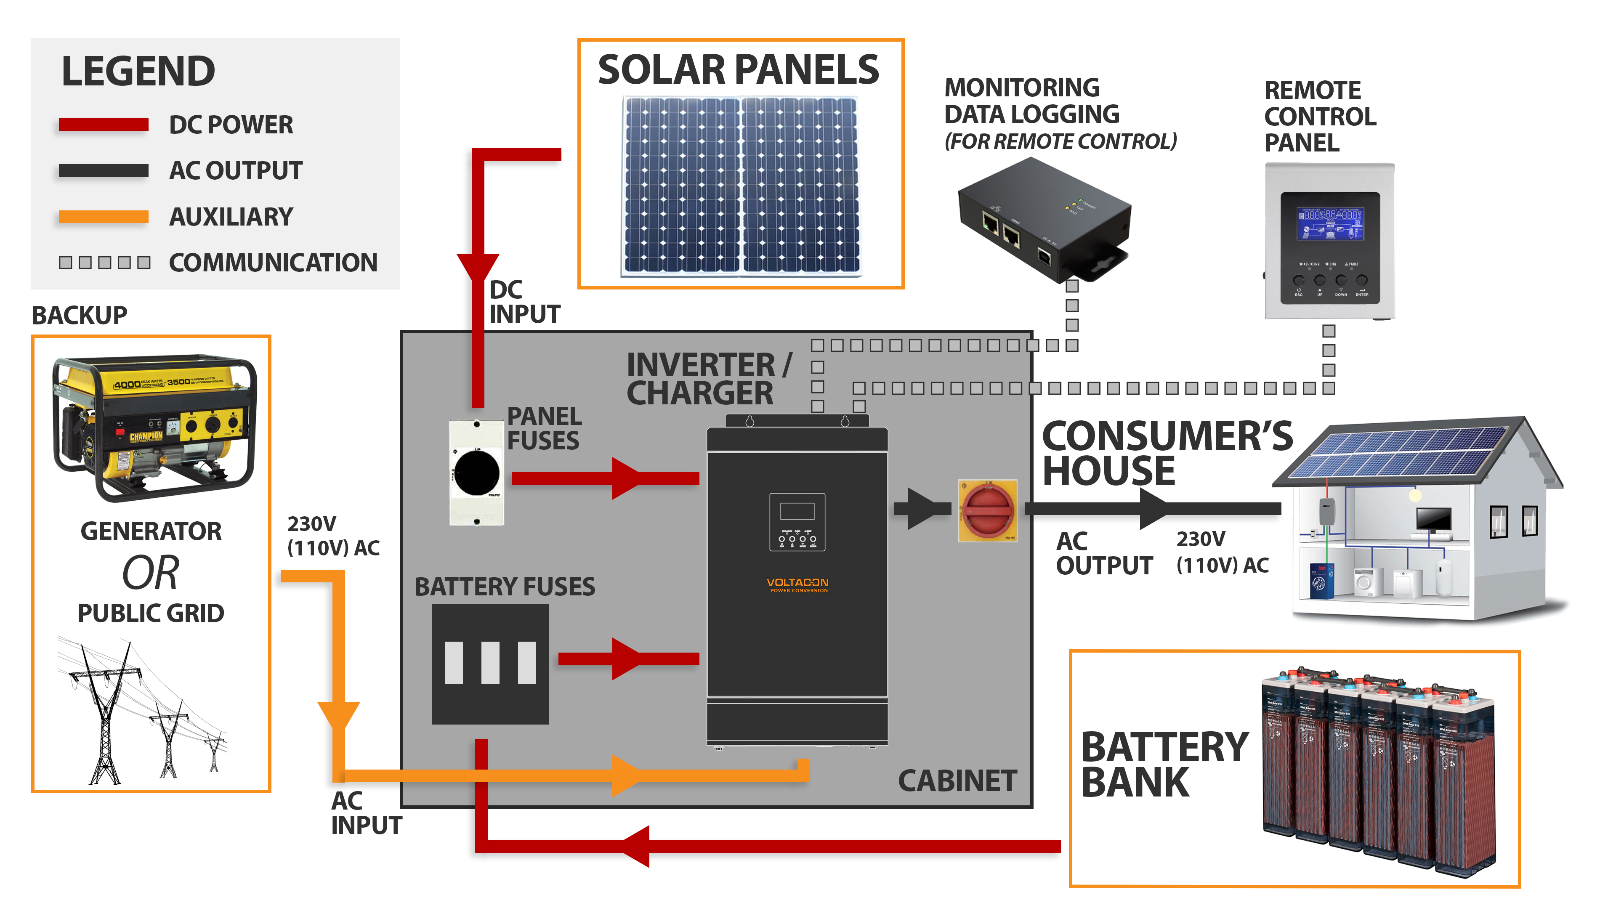 Solar Wiring Diagram Off Grid Honda Gx160 Carburetor Parts 5000w System Agm Batteries 48v 230v